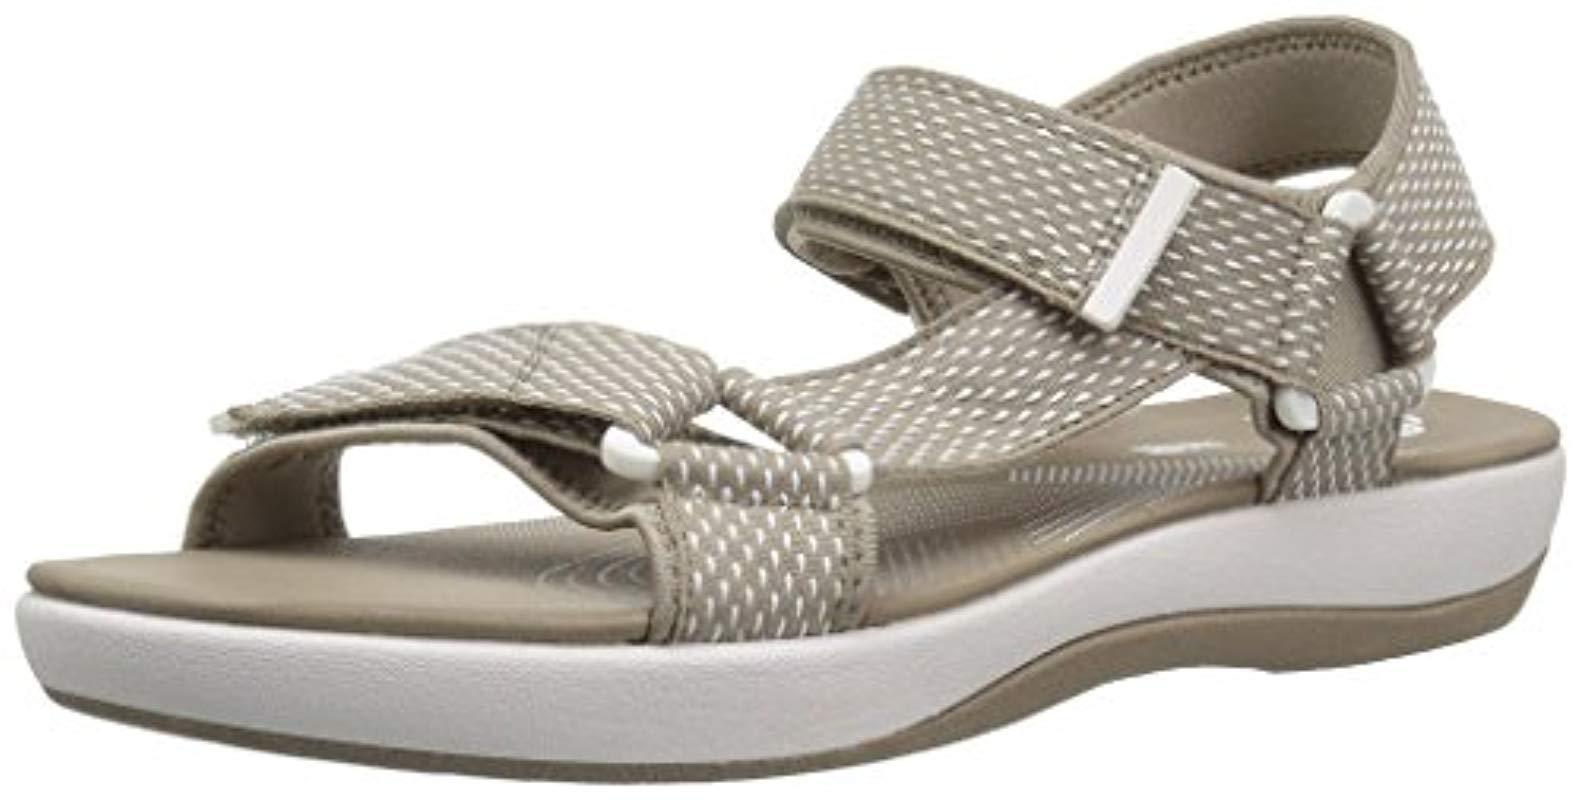 1a52e5a2da2 Lyst - Clarks Brizo Cady Flat Sandal - Save 60%